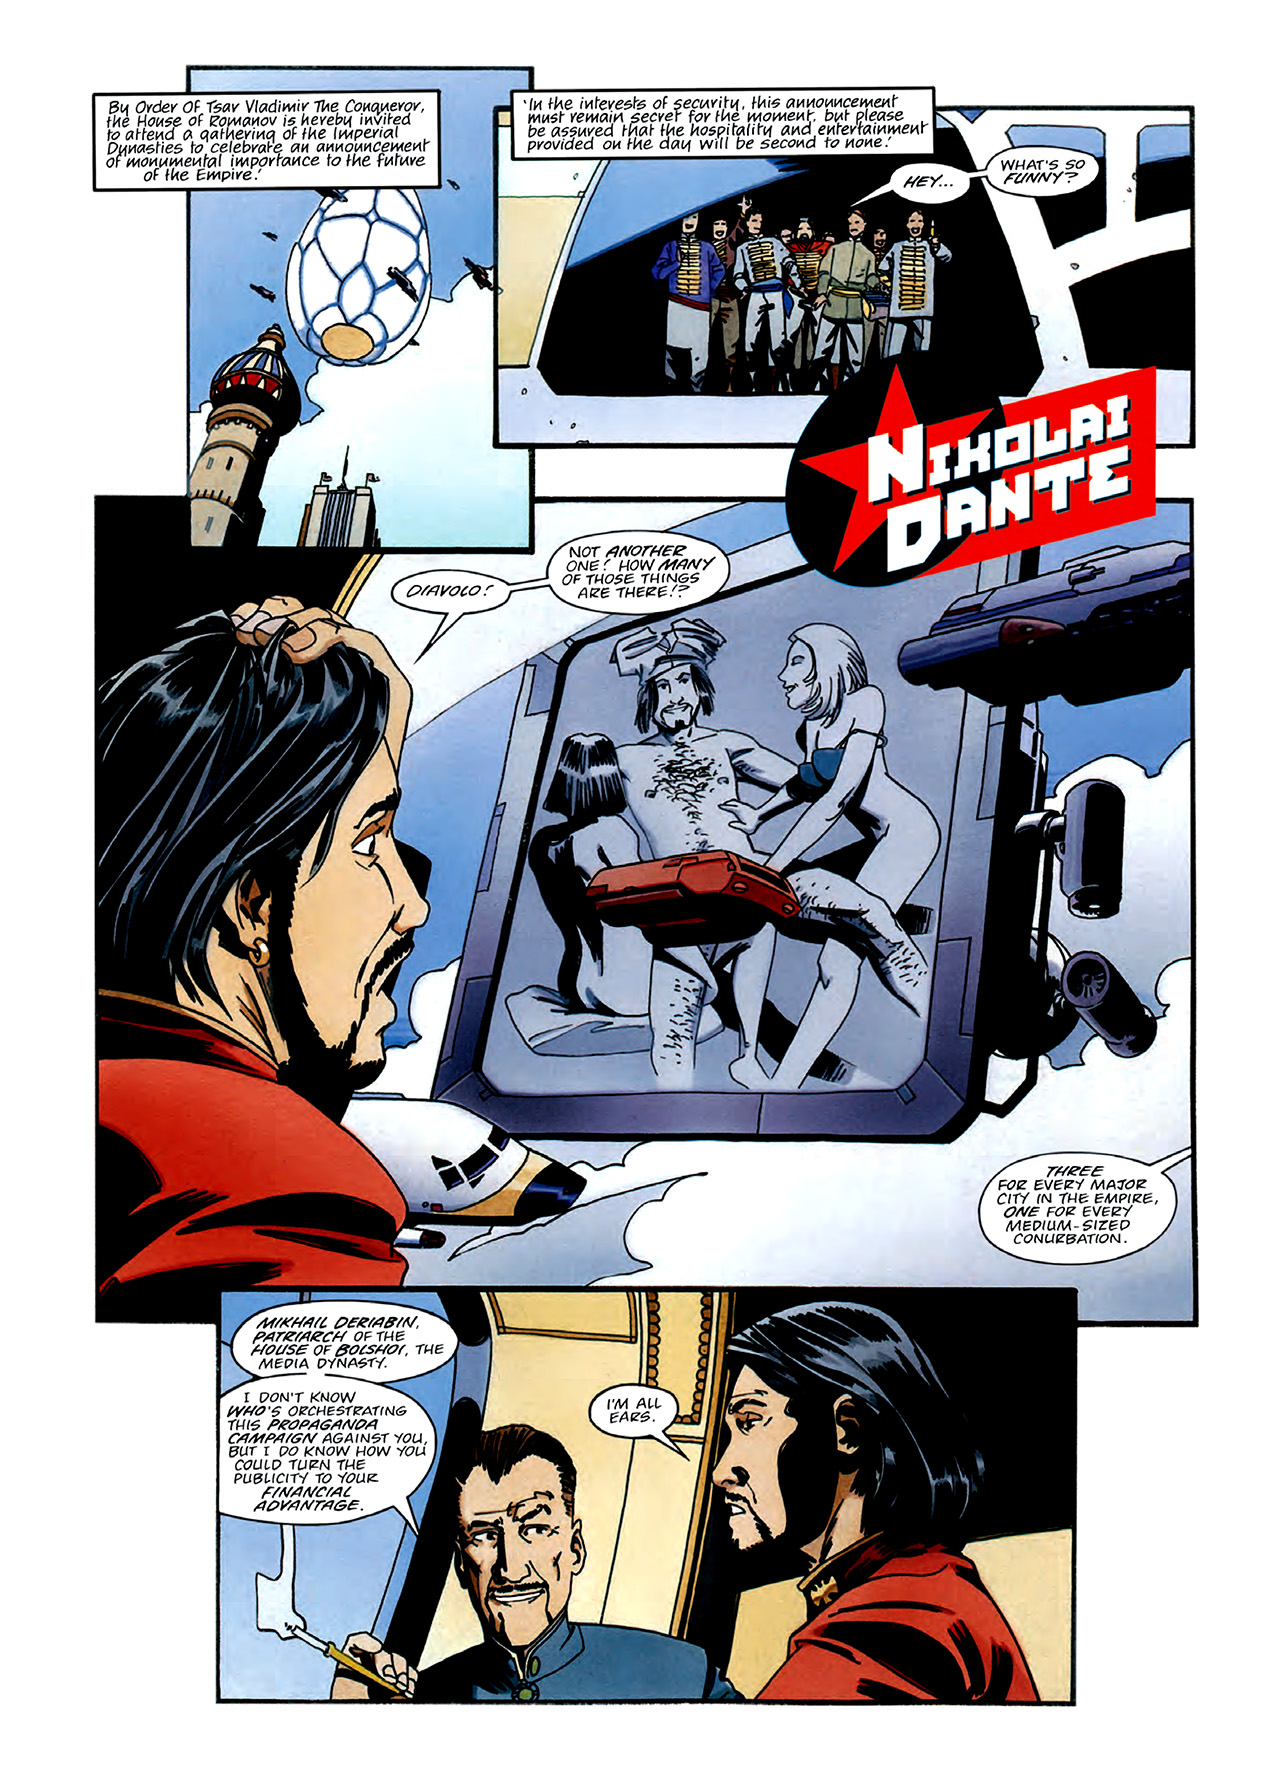 Read online Nikolai Dante comic -  Issue # TPB 3 - 6